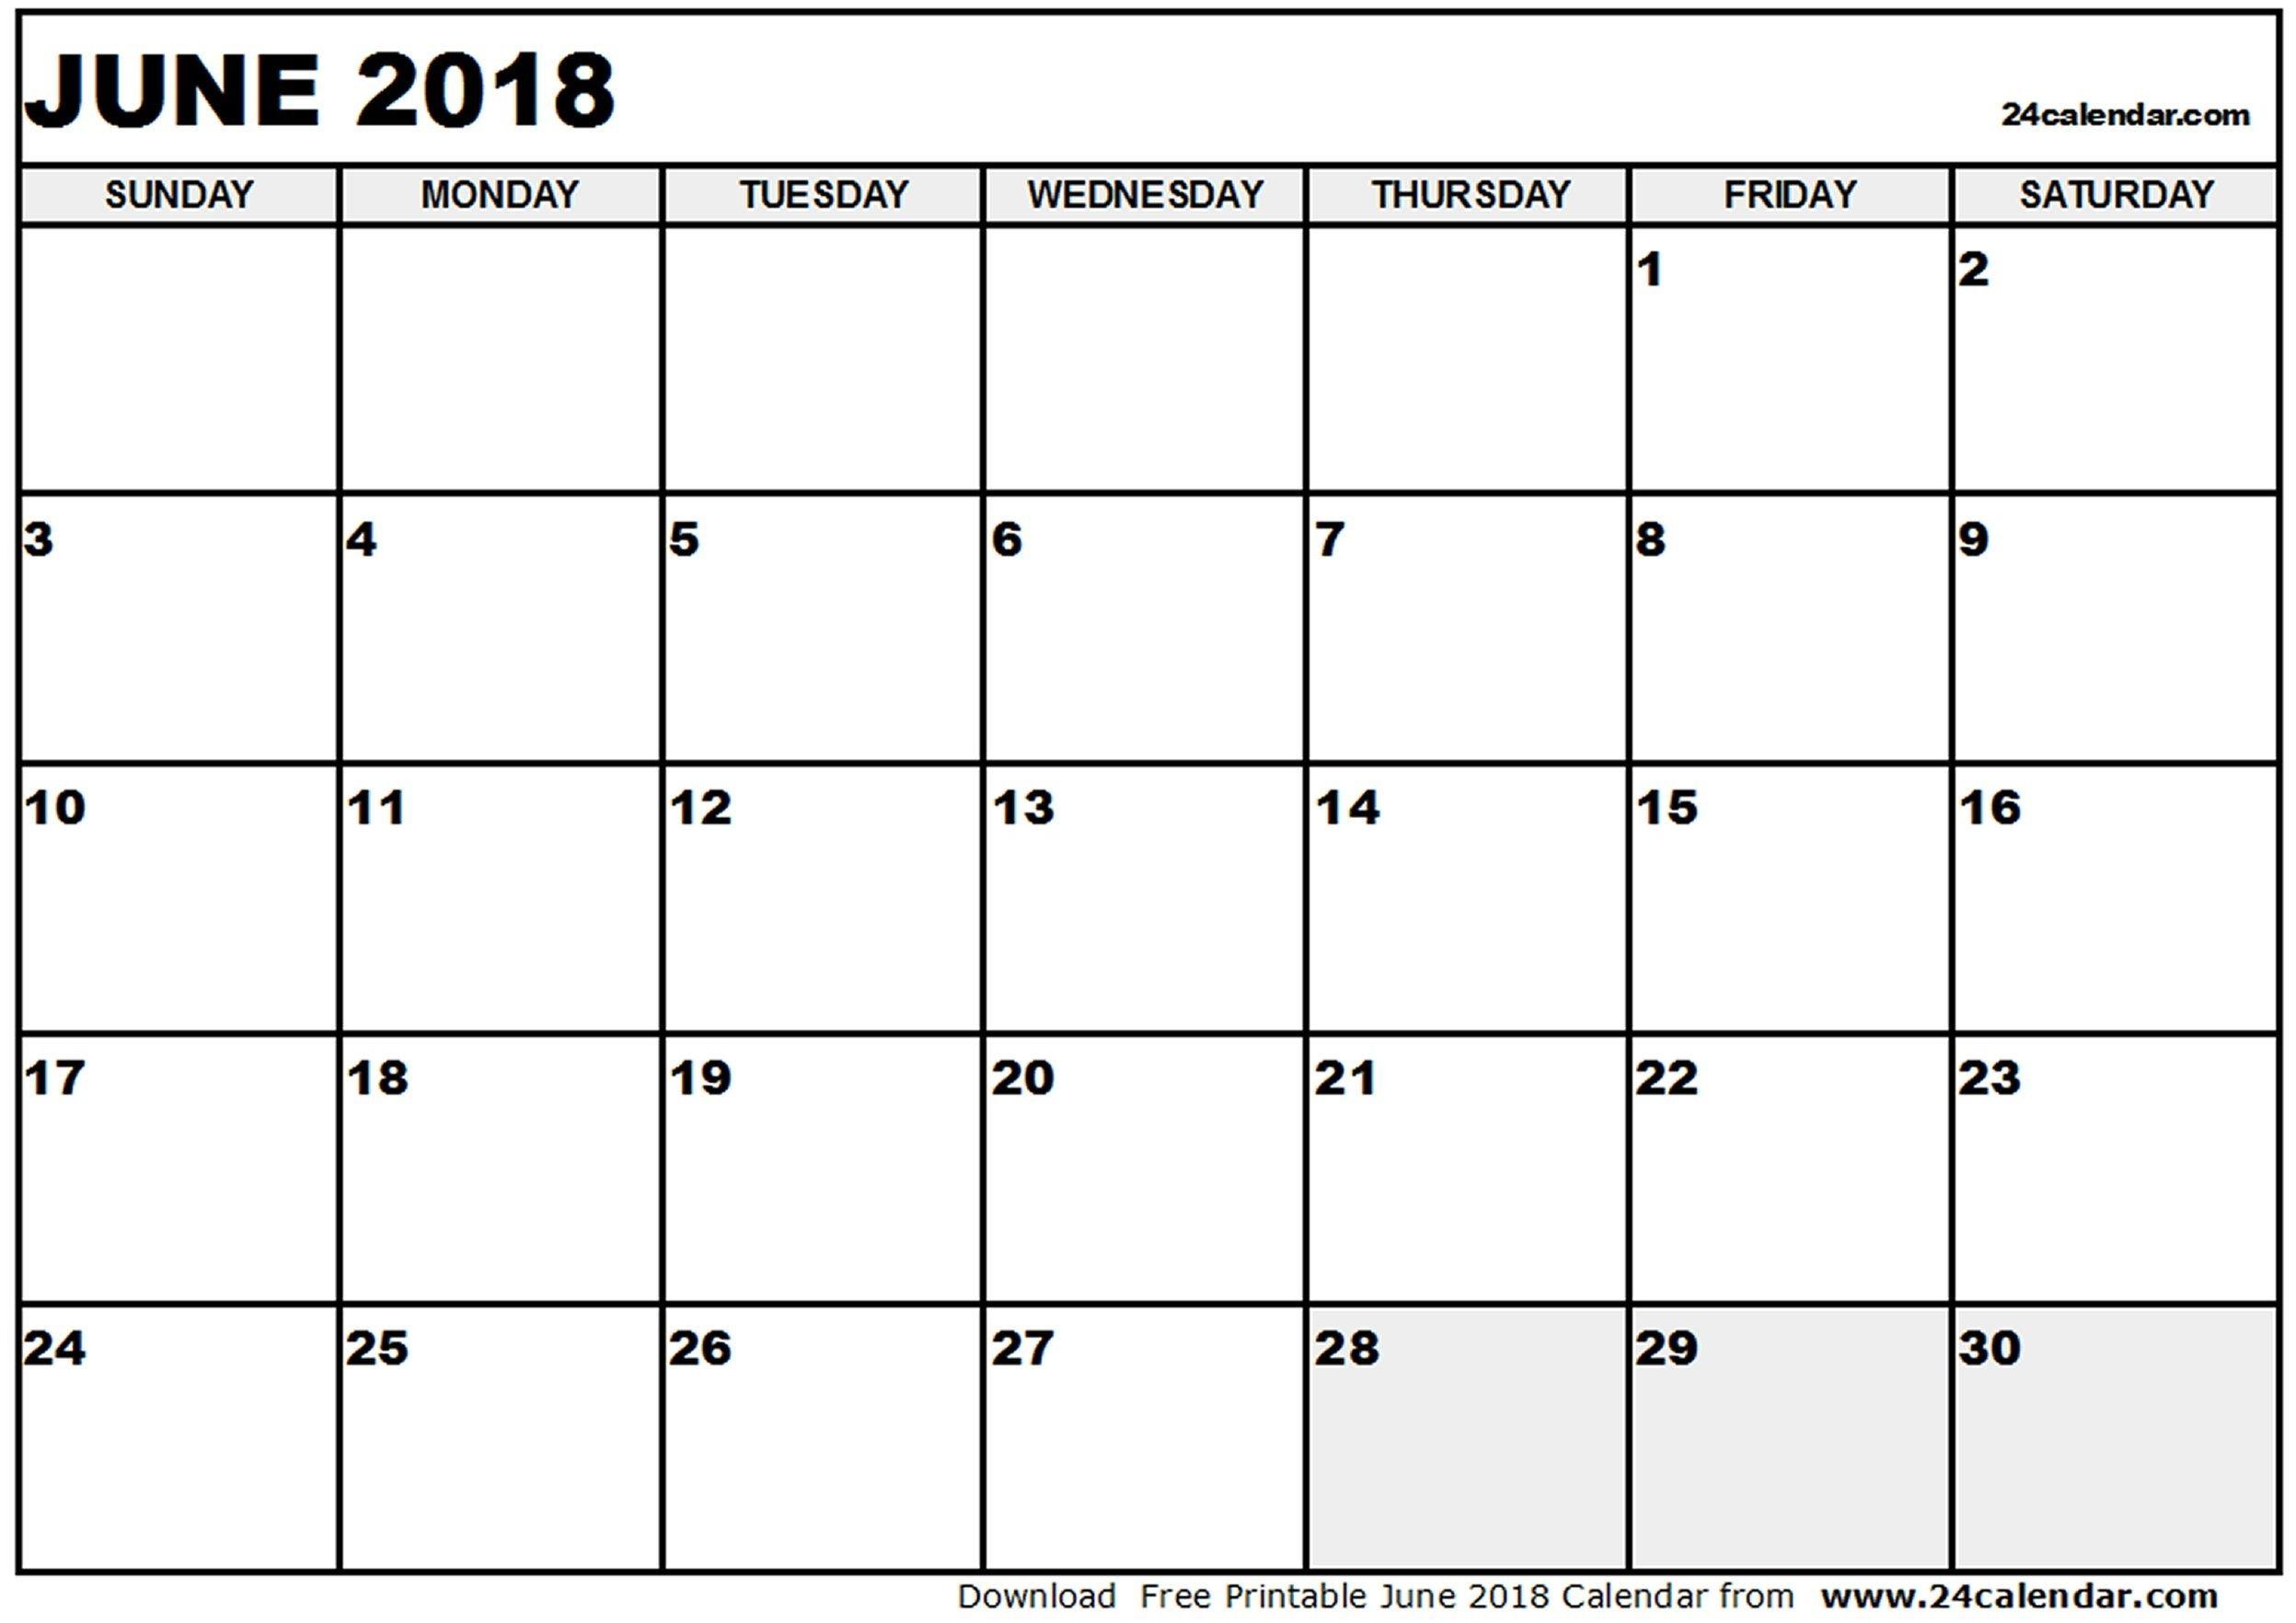 Wedding decorations table october 2018 june and july  calendar printable larissanaestrada  Cute